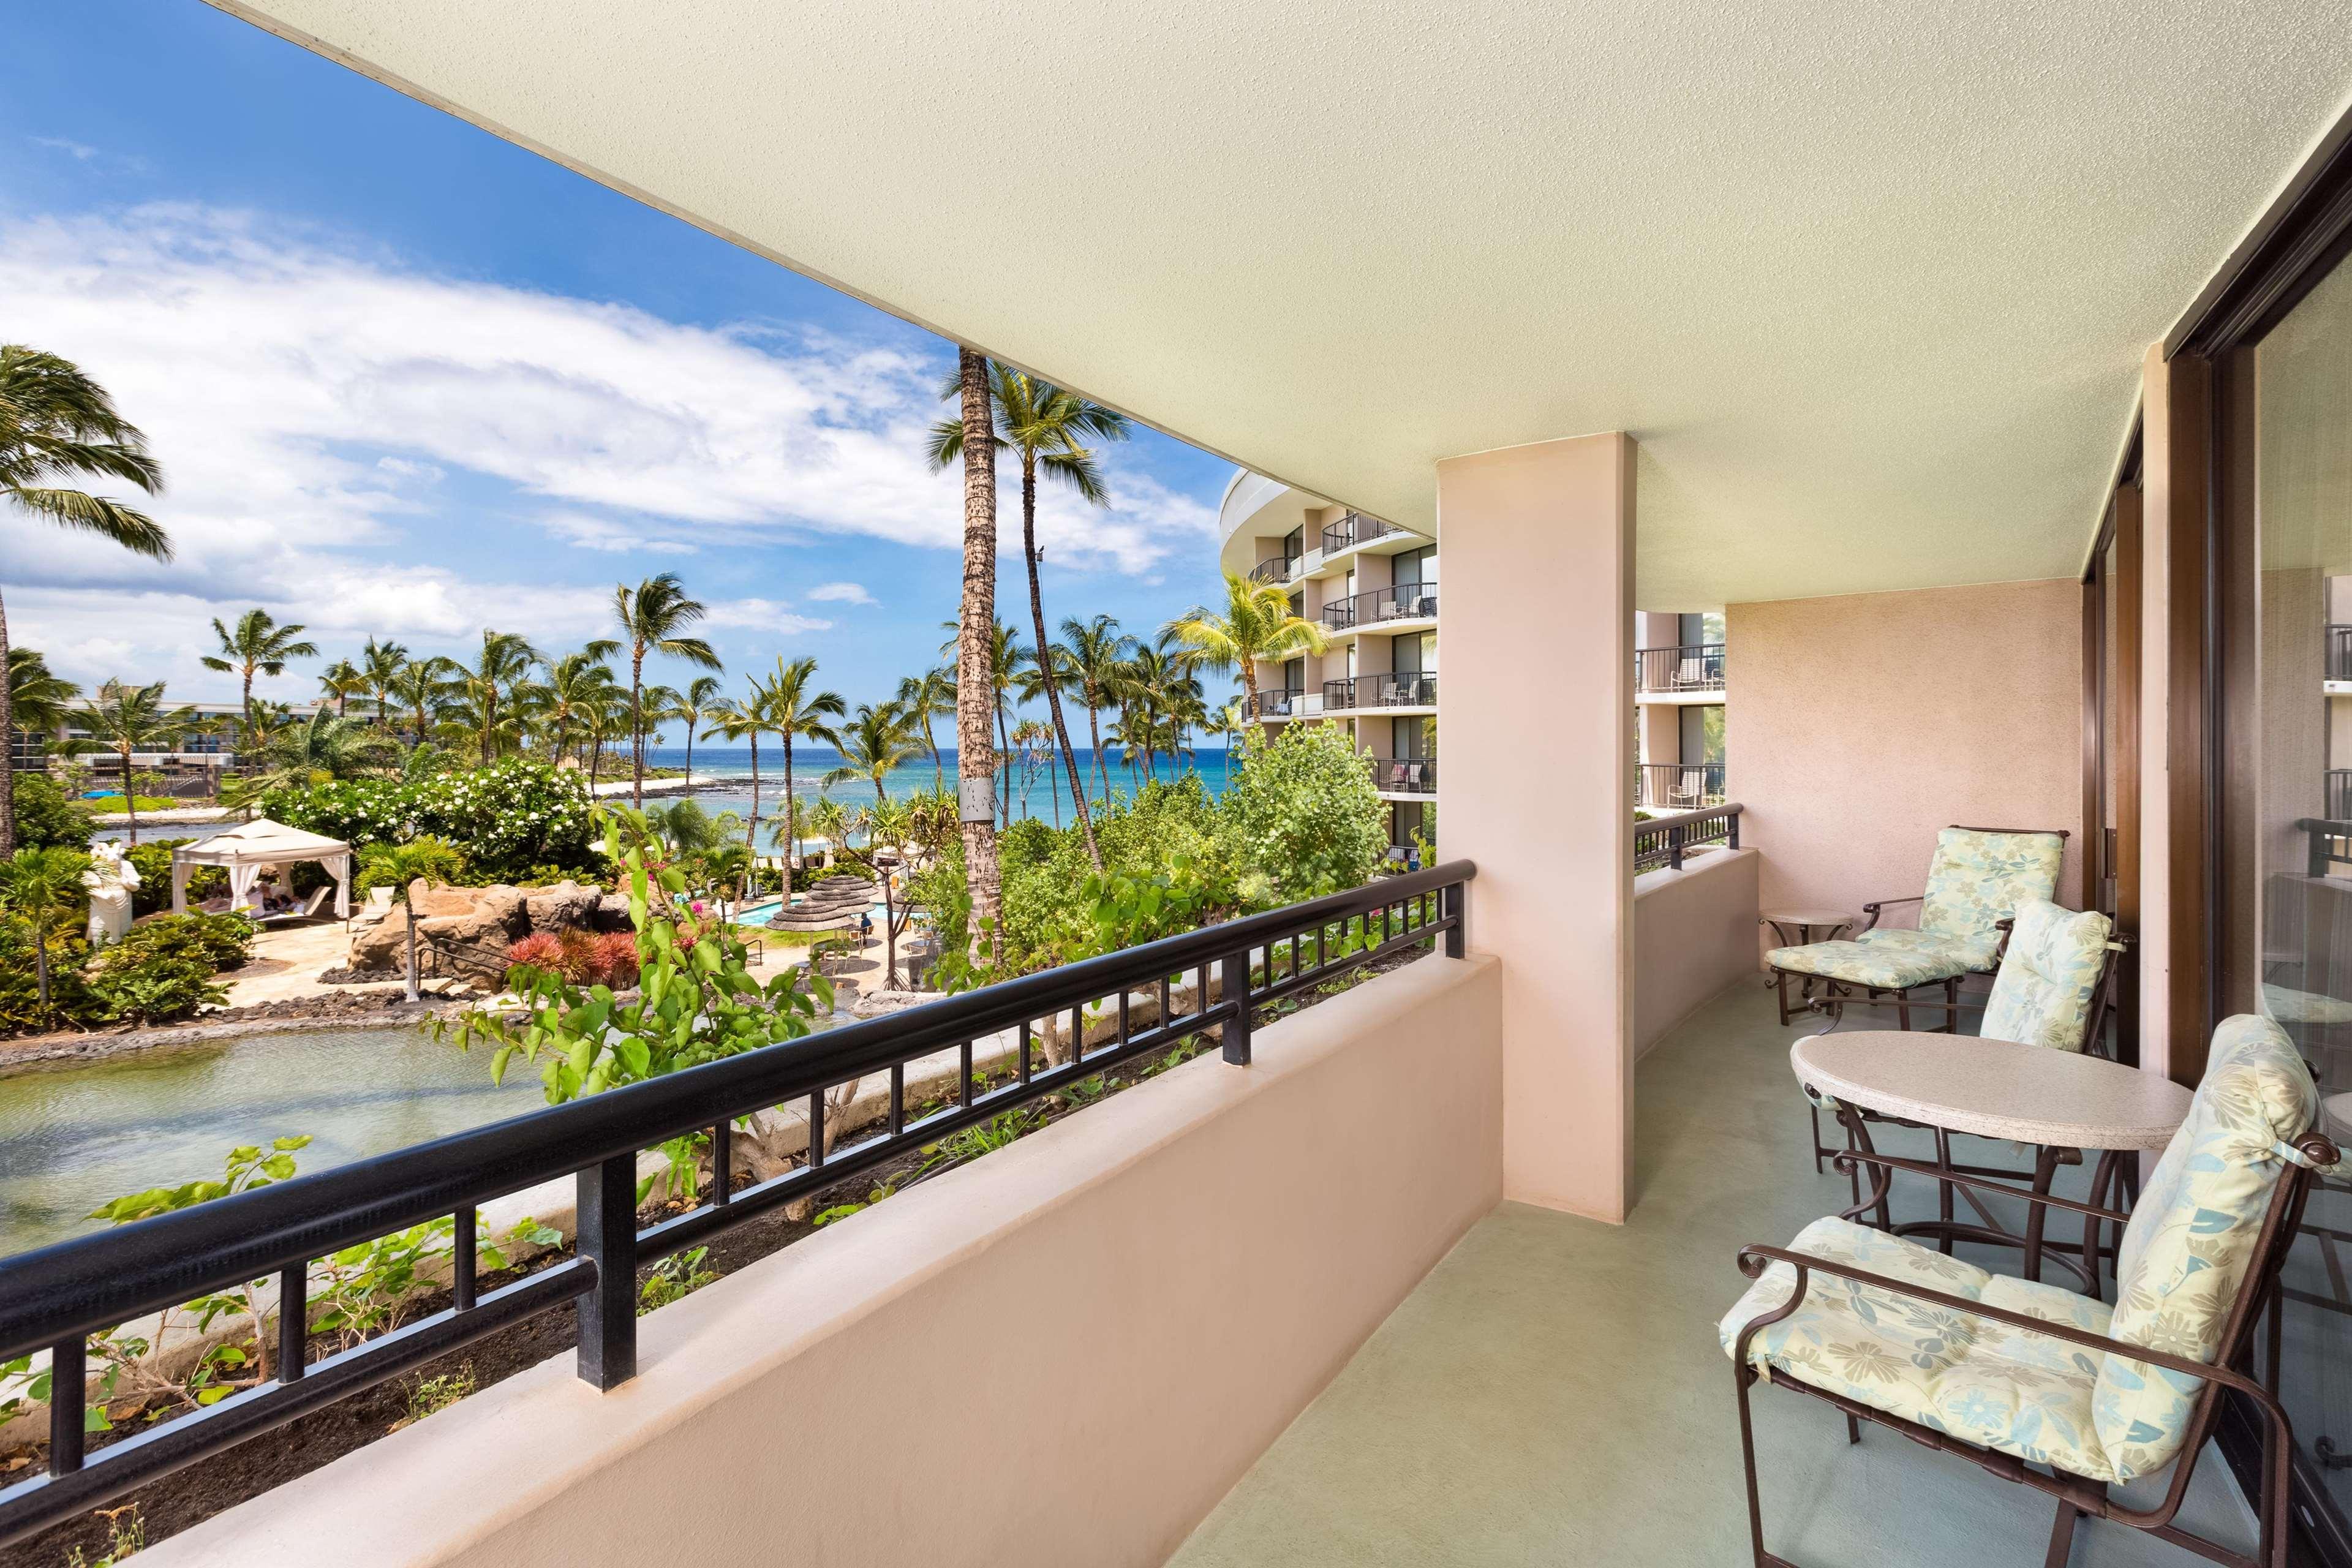 Hilton Waikoloa Village Restaurants Near